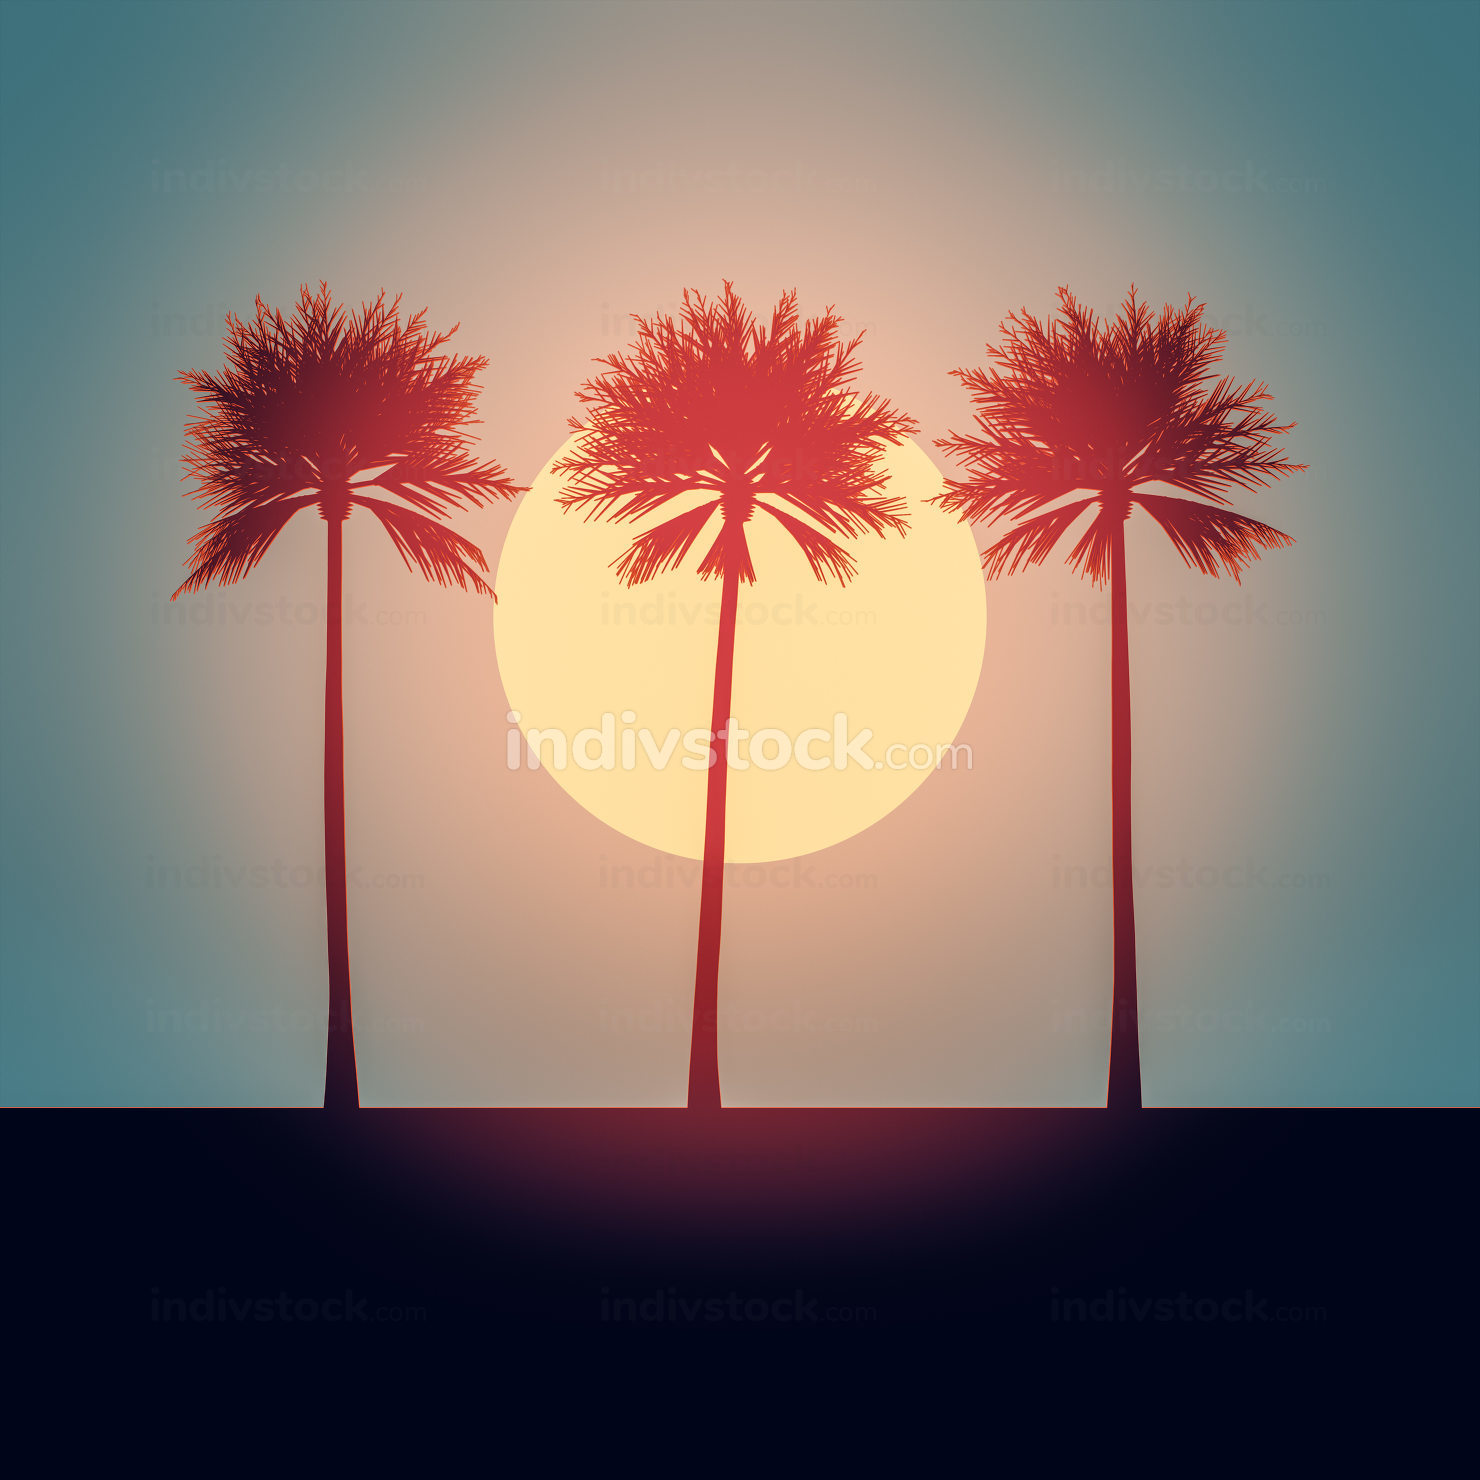 beautiful palm trees sunset background